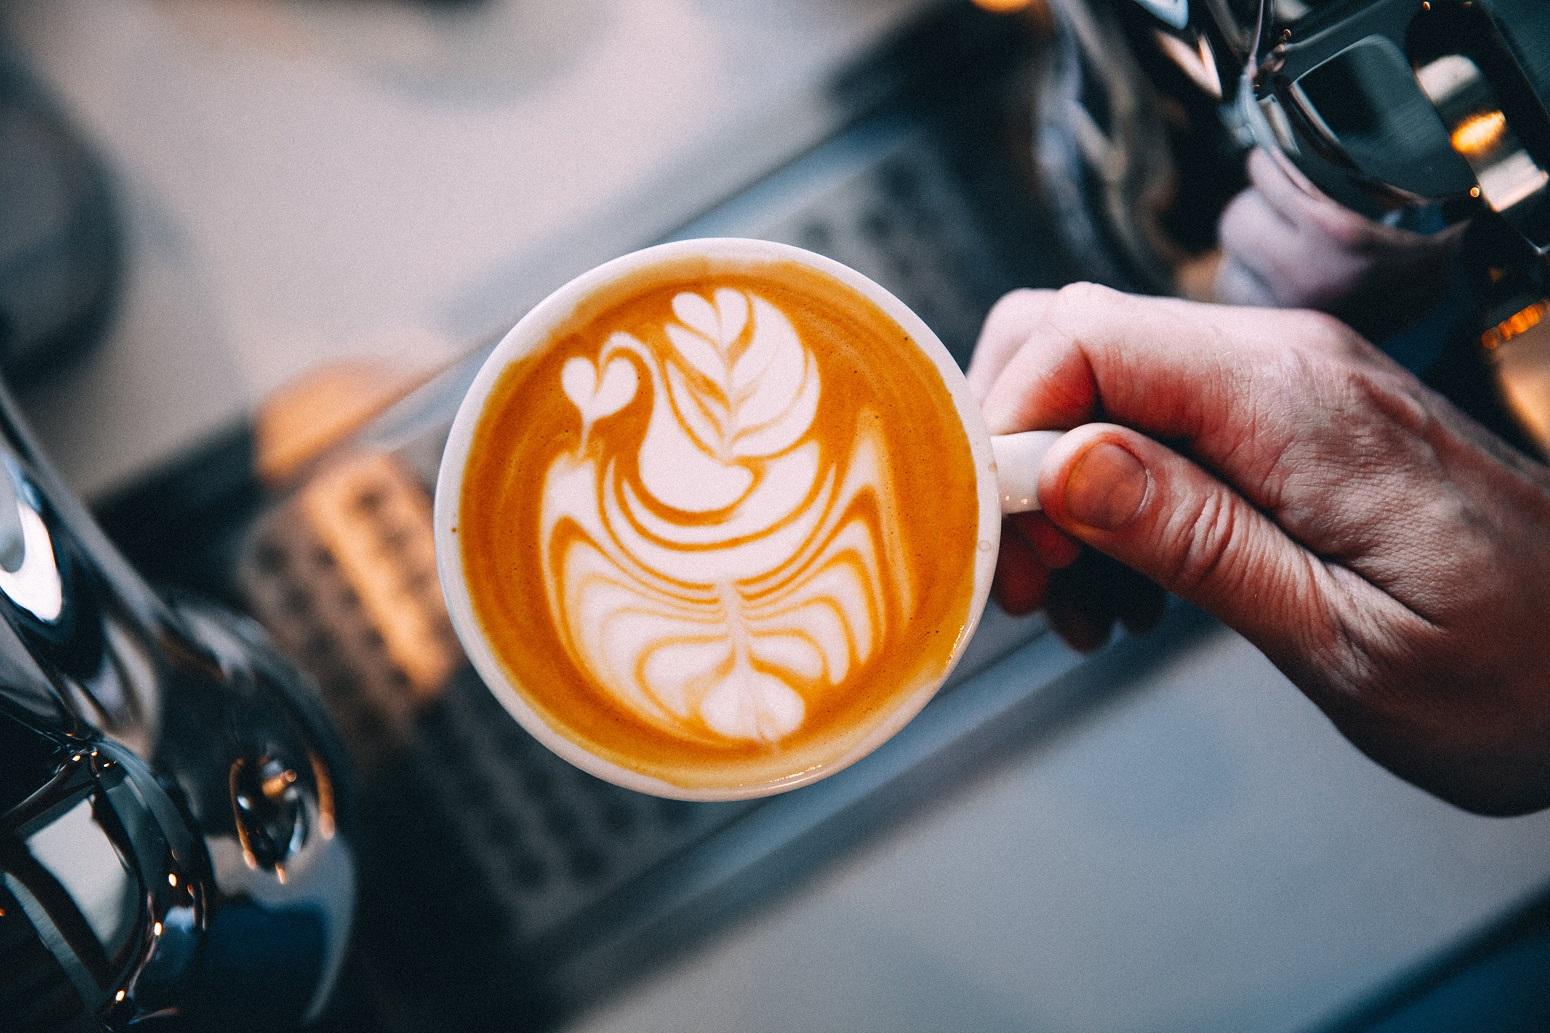 20200916-2057-3-kafijas-automati.jpg